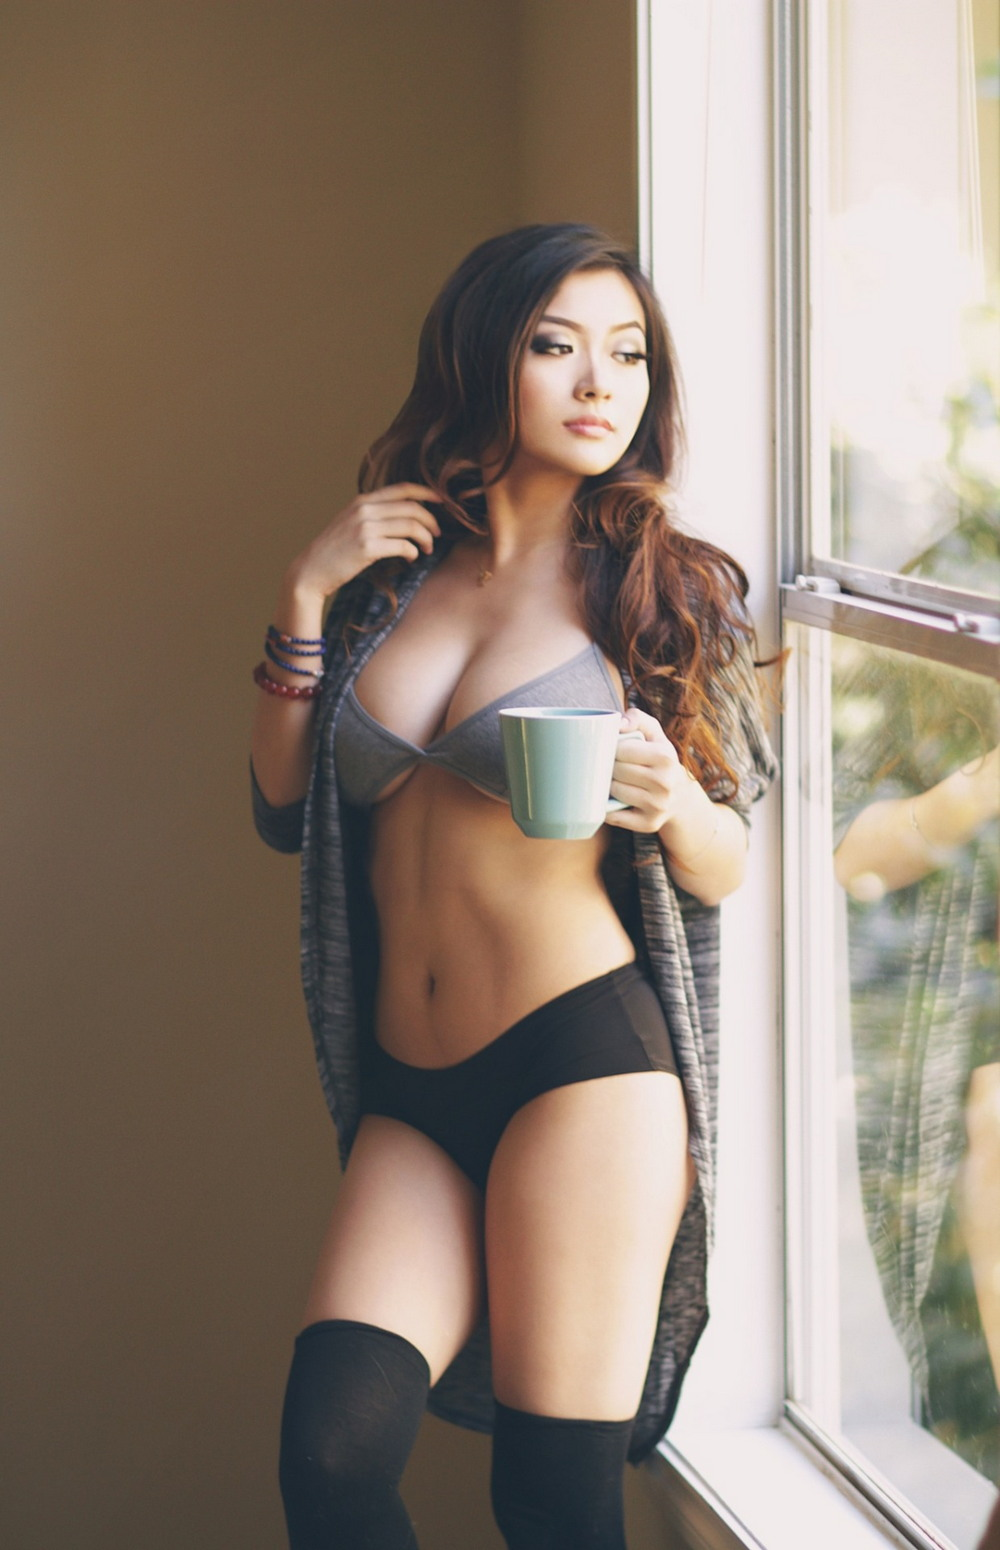 American Daydreams Asa Akira Just Skirt Free Token Sex Hd Pics